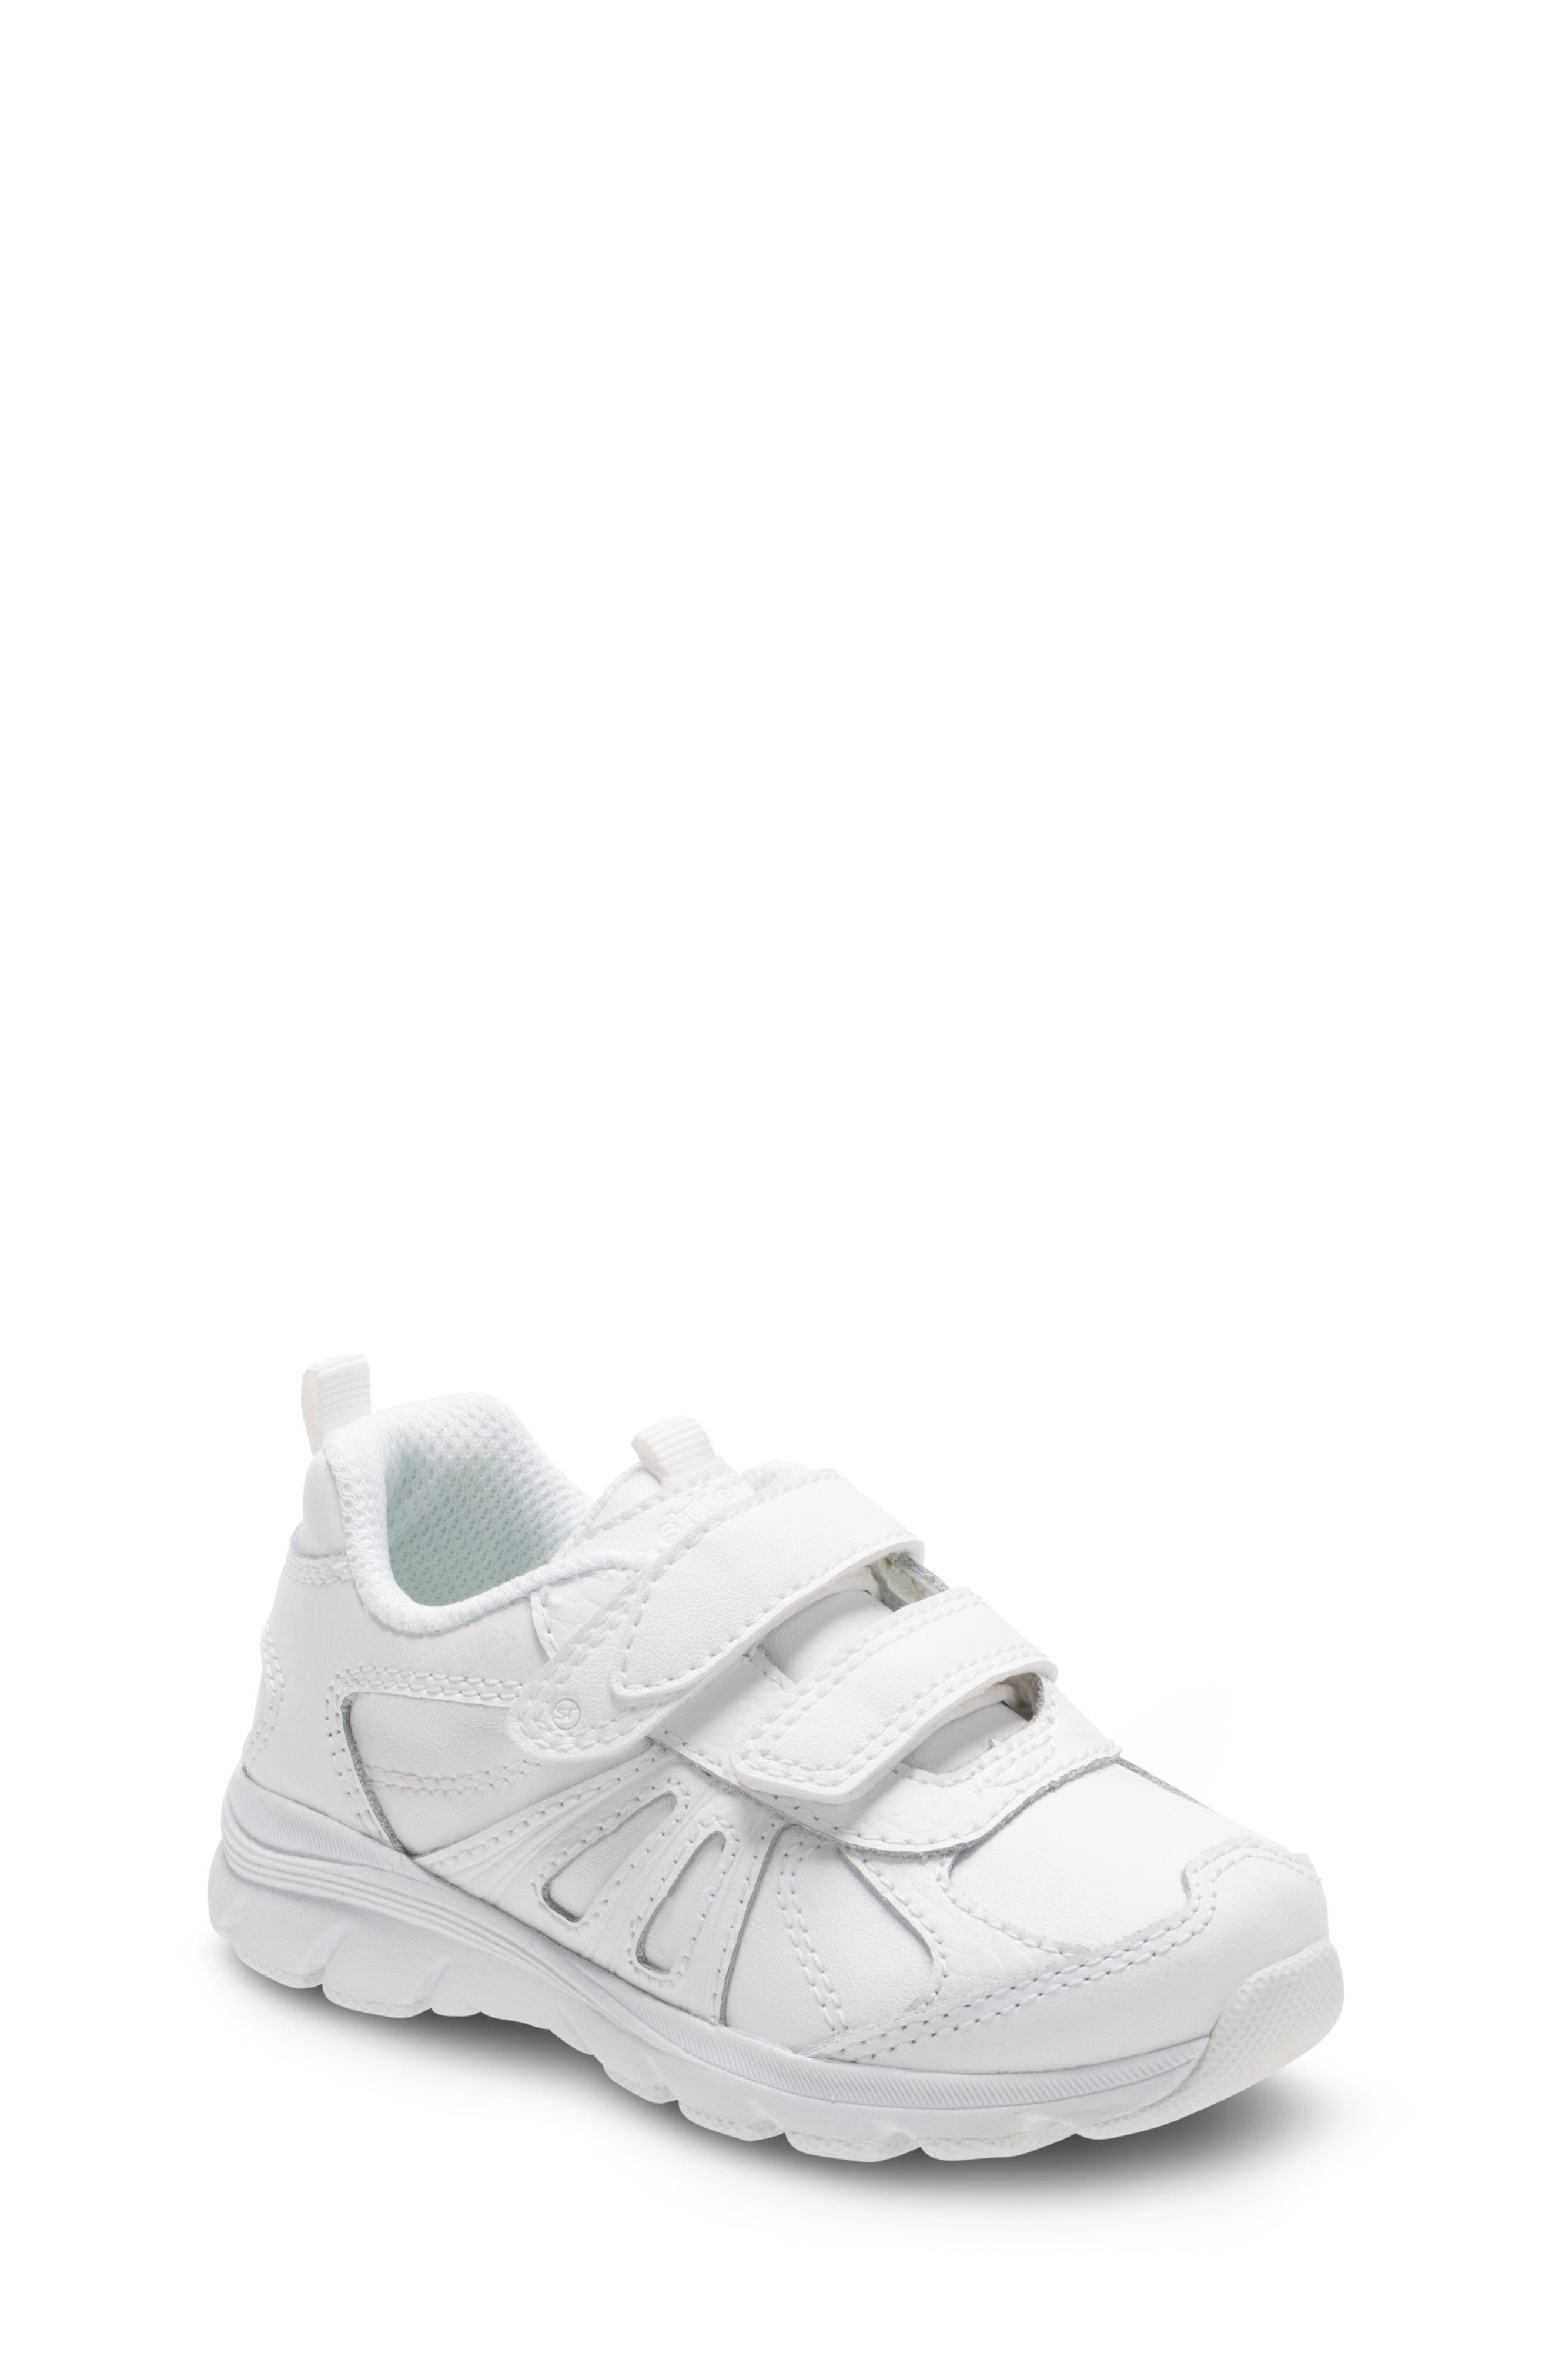 Toddler Stride Rite Cooper 20 Sneaker Size 10 XW  White